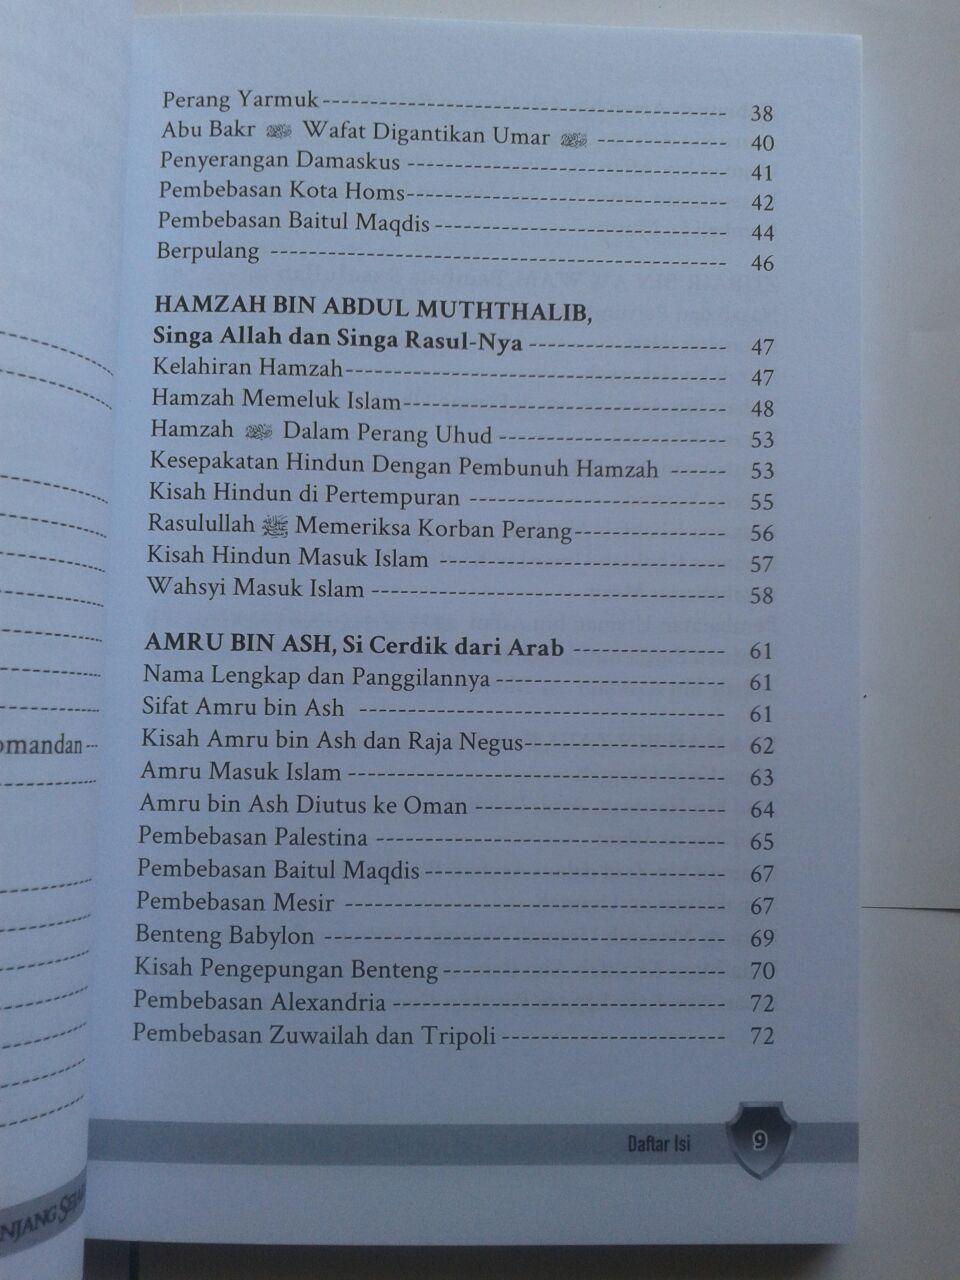 Buku Jenderal Islam Paling Berpengaruh Sepanjang Sejarah isi 4